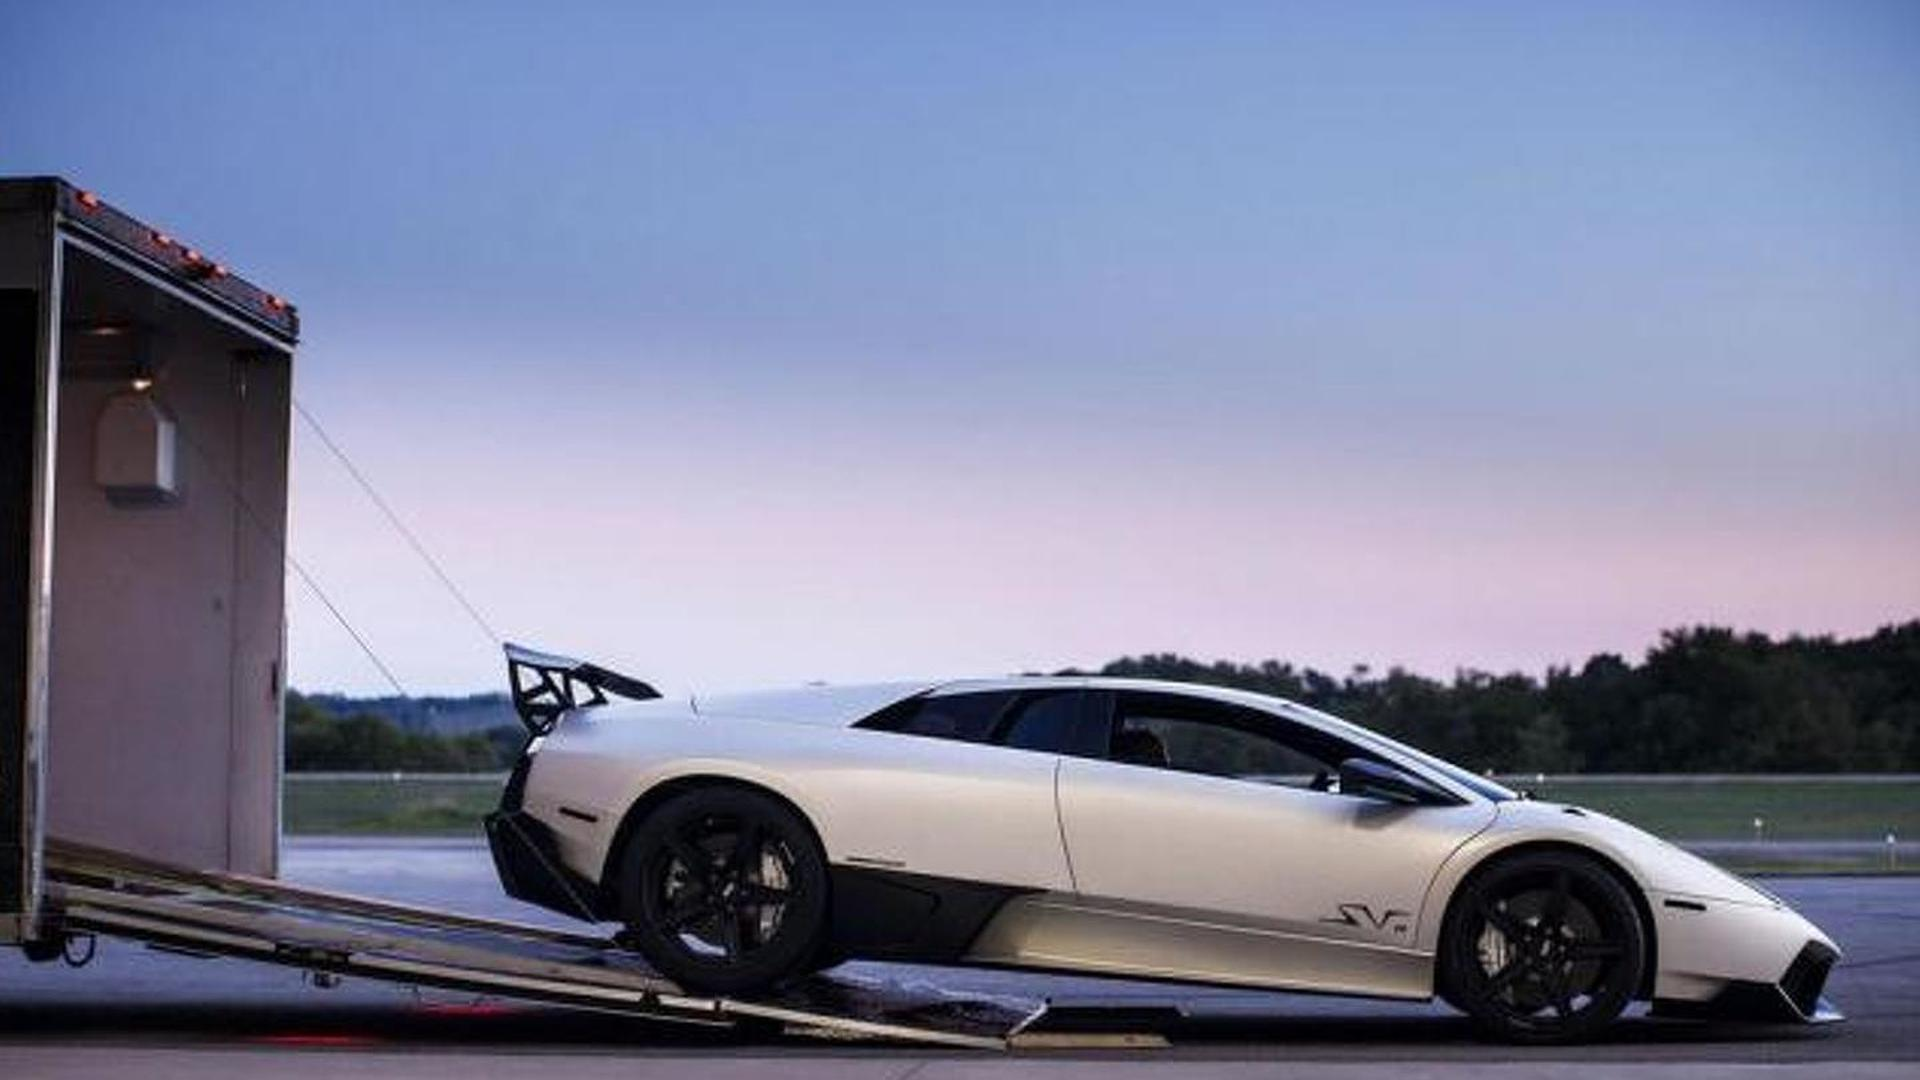 Lamborghini Murcielago Lp2000 2 Sv Twin Turbo Has 2 000 Rwhp Video